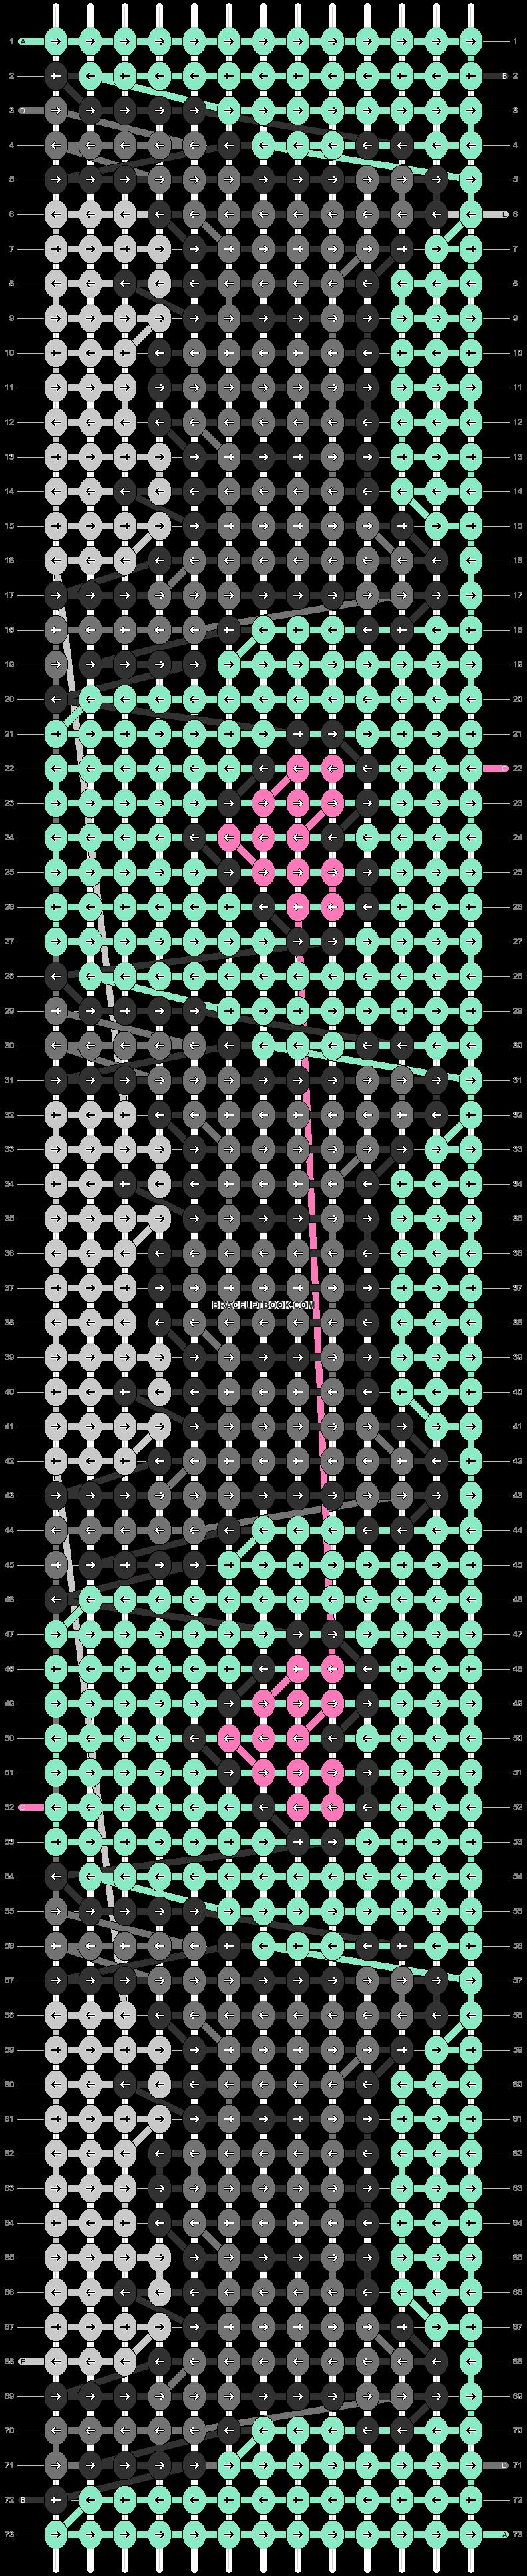 Alpha pattern #90036 pattern